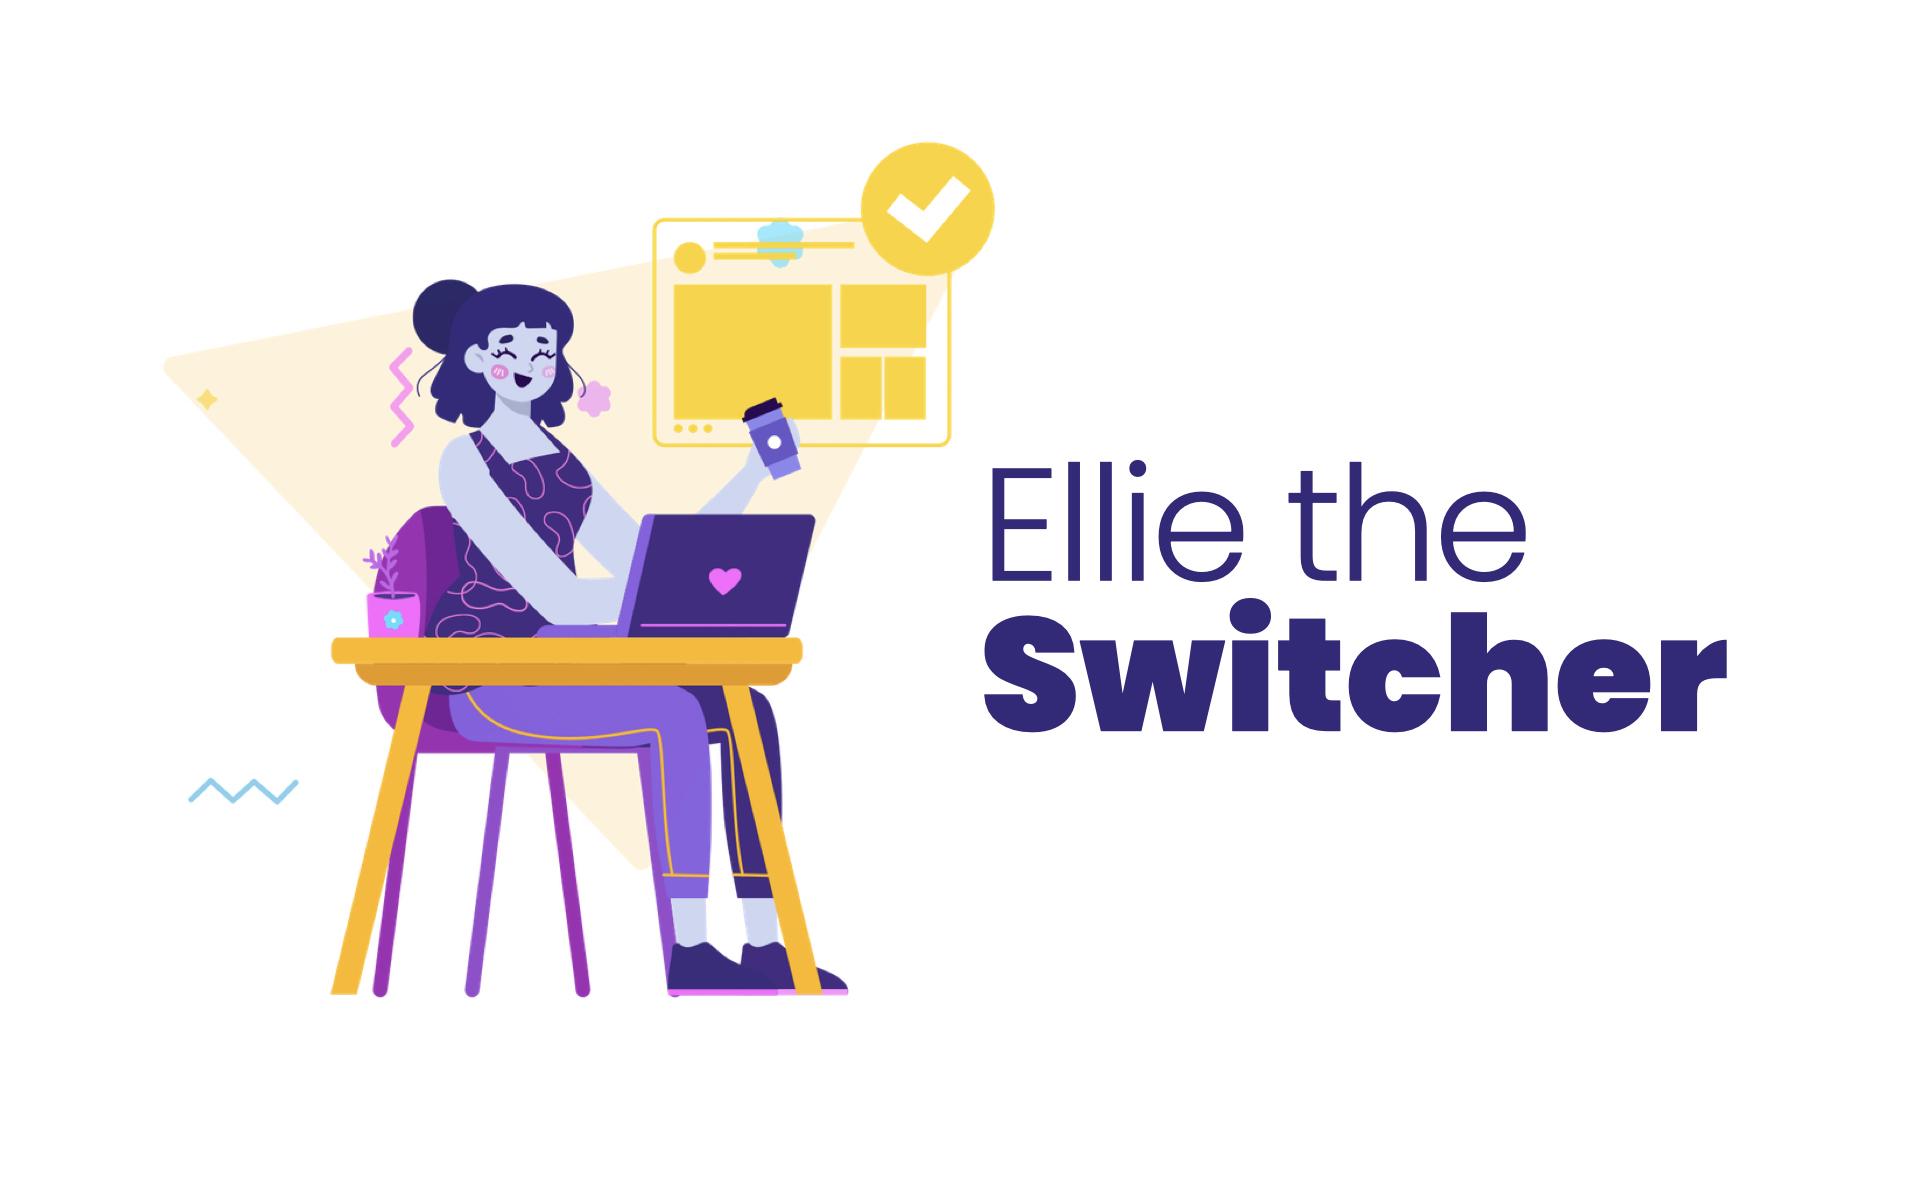 Ellie the switcher illustration